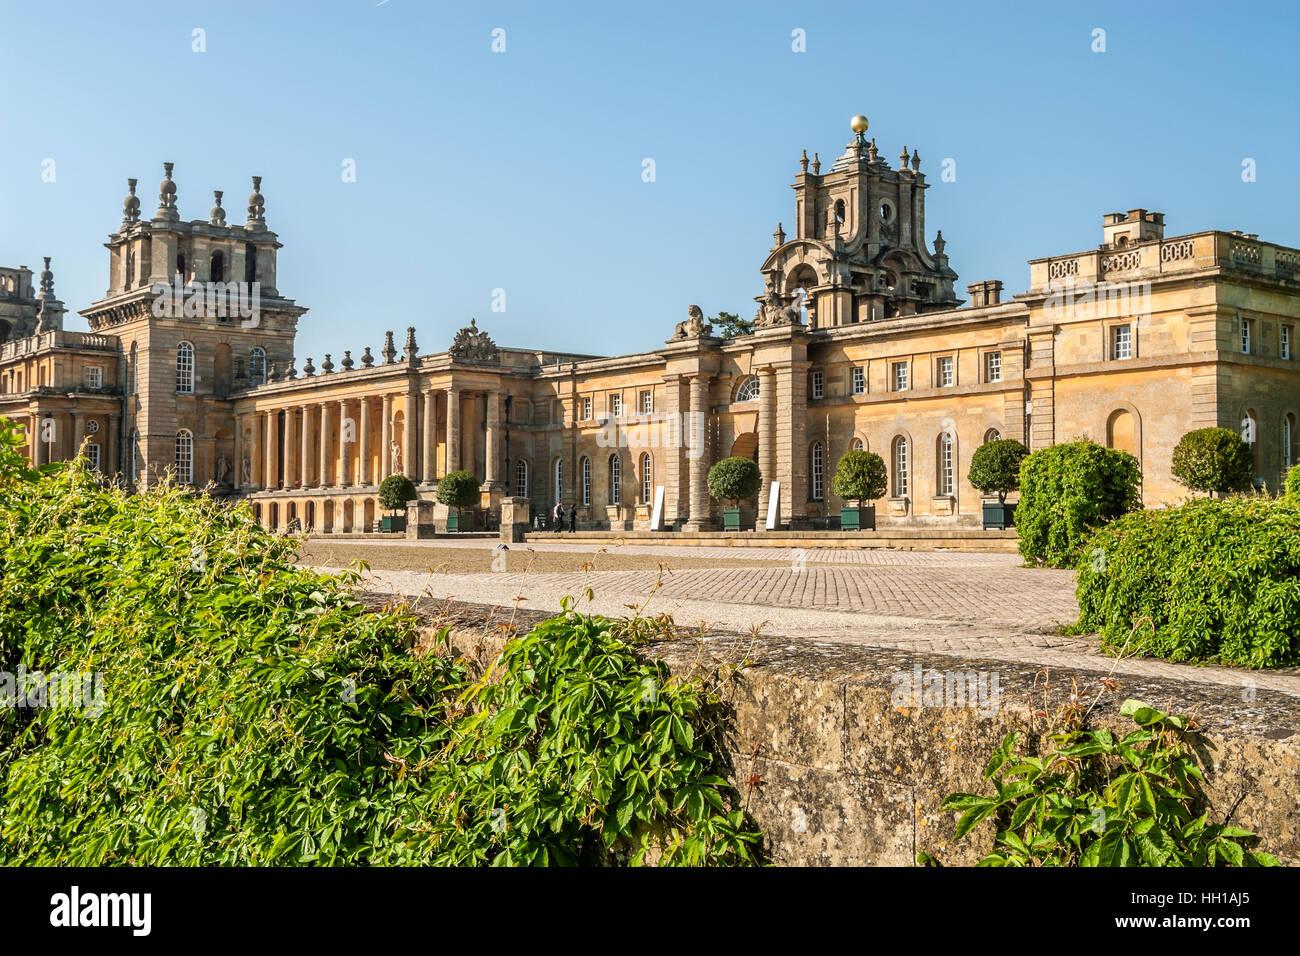 Blenheim Palace near Oxford, England Stock Photo